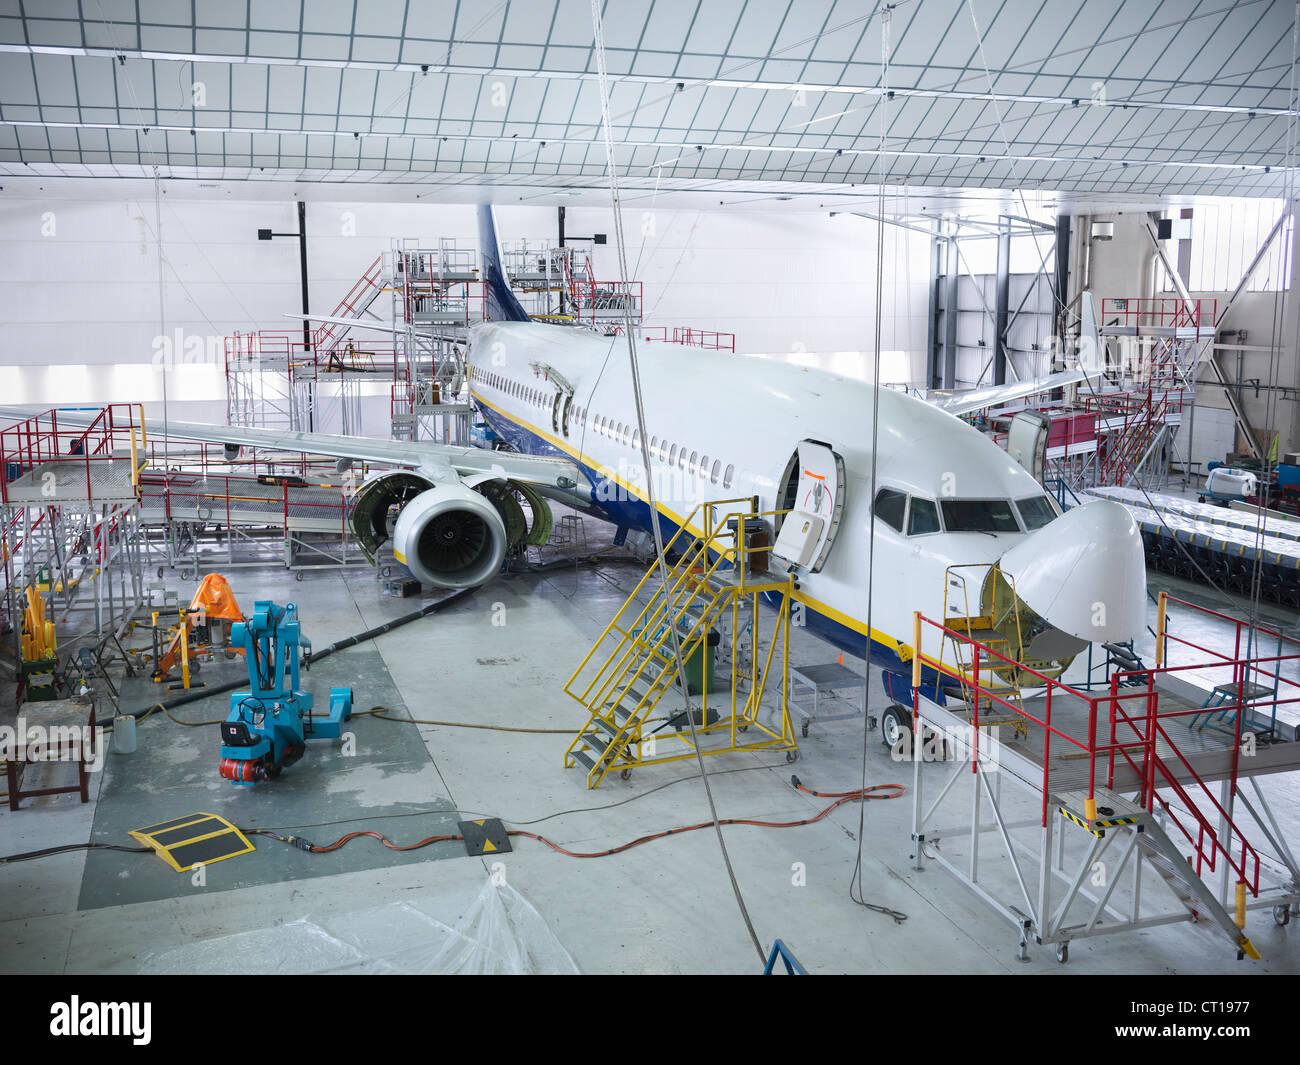 Flugzeug im Hangar gebaut Stockbild